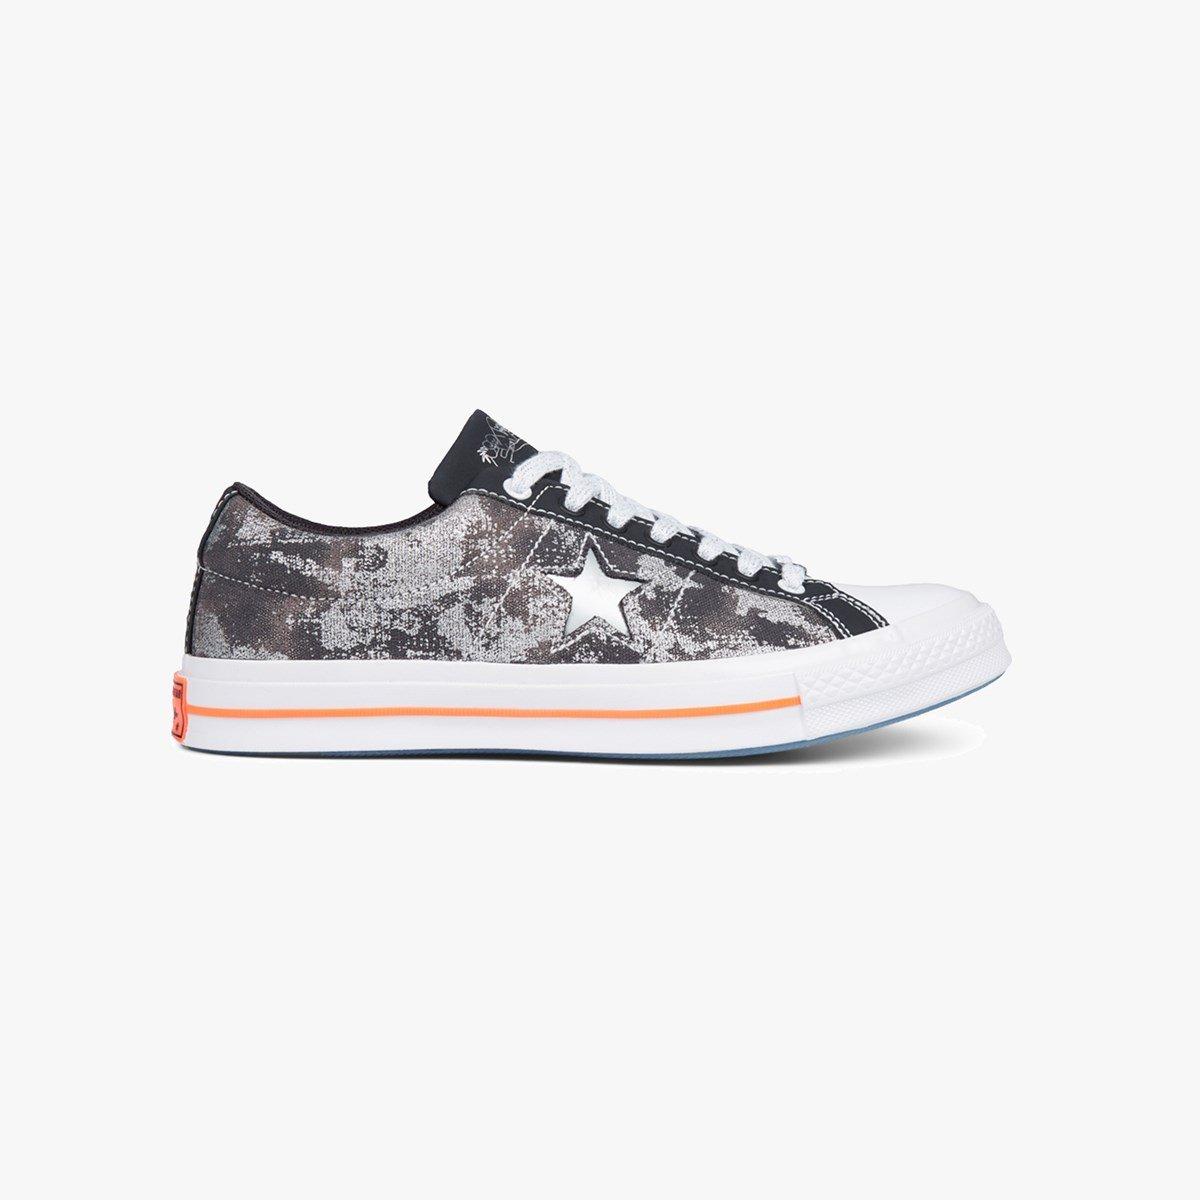 Nowe Produkty tania wyprzedaż ekskluzywny asortyment Converse One Star x Sad Boys - 165743c - Sneakersnstuff | sneakers &  streetwear på nätet sen 1999